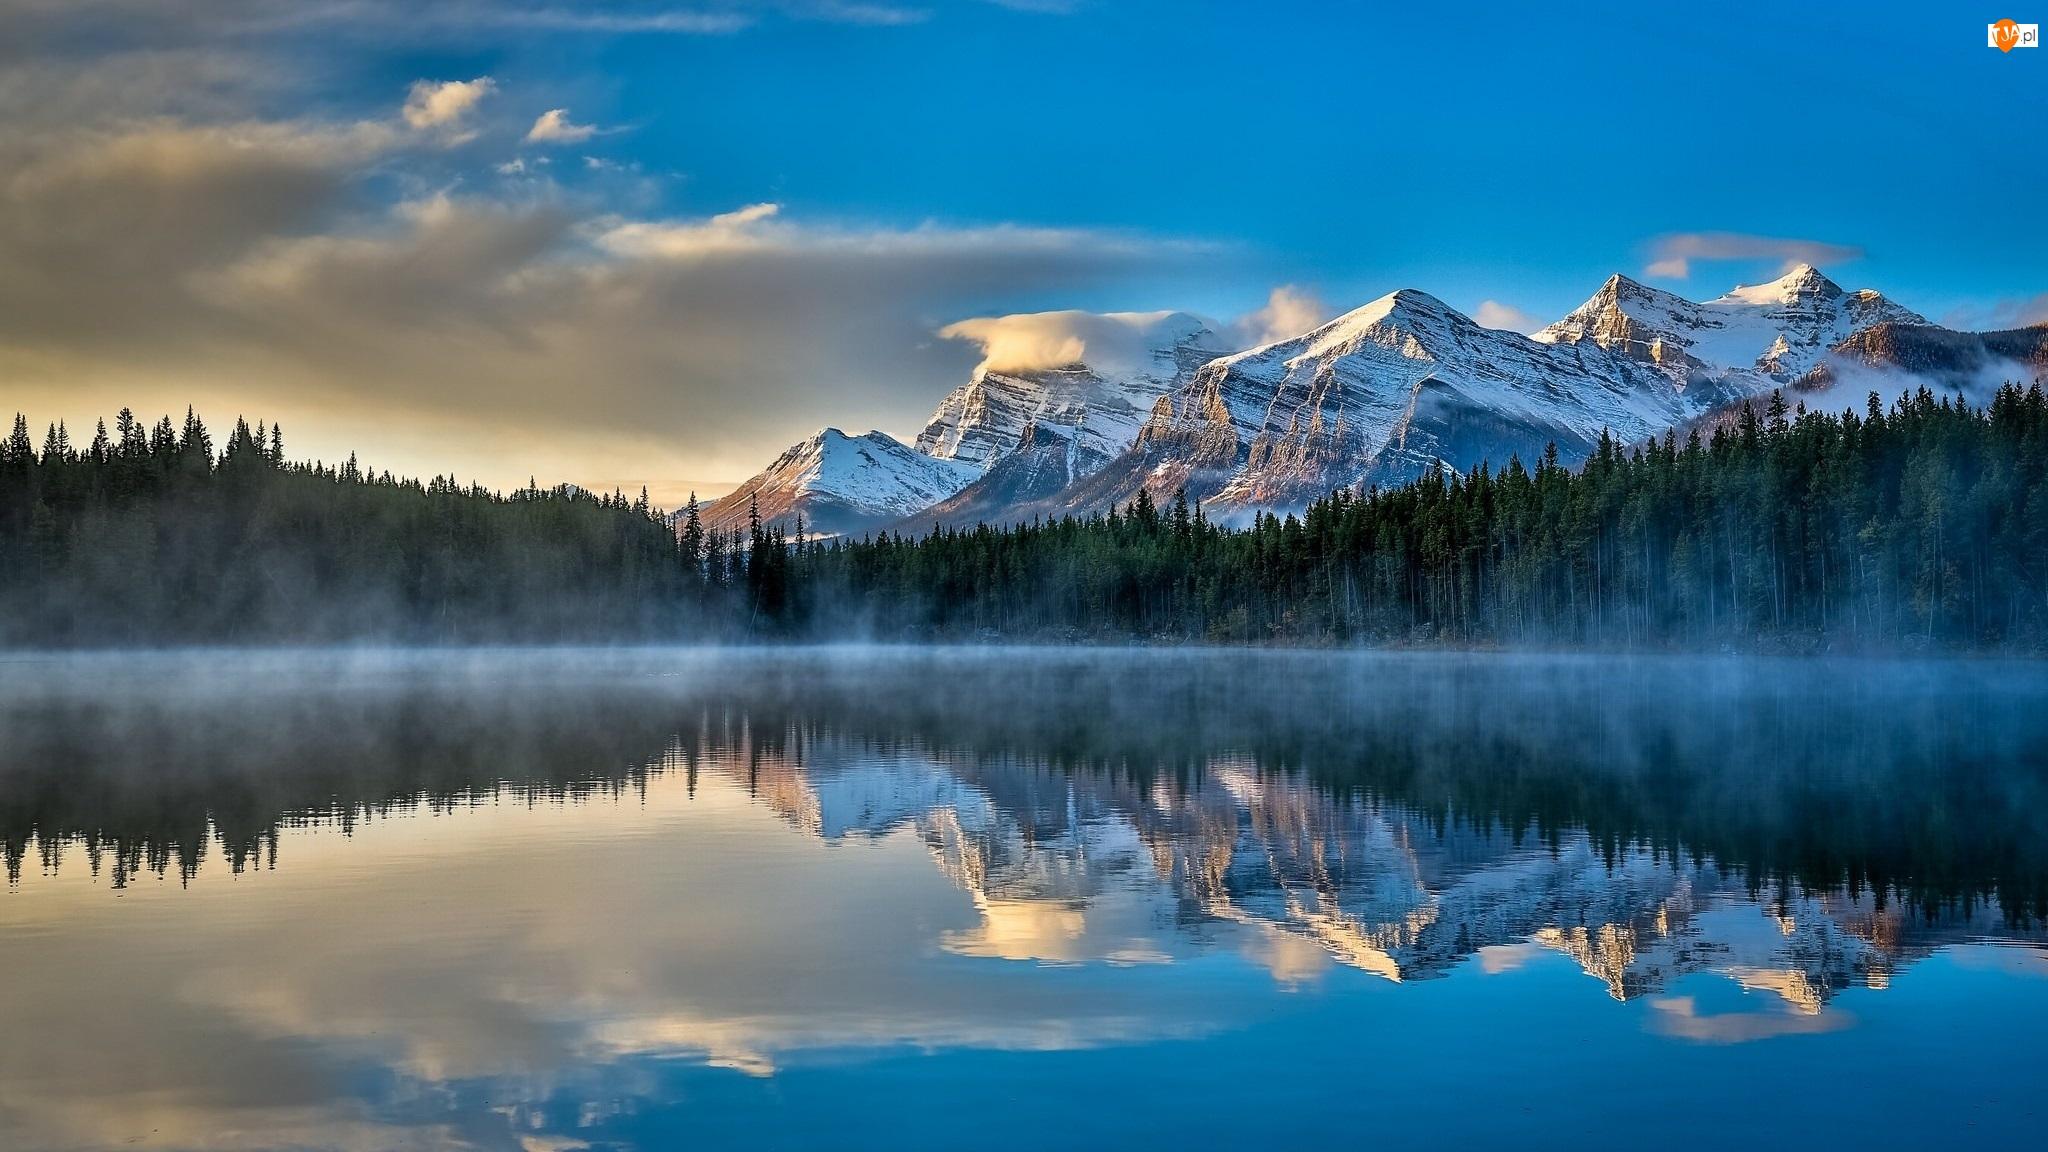 Mgła, Las, Park Narodowy Banff, Kanada, Odbicie, Jezioro Herbert, Góry